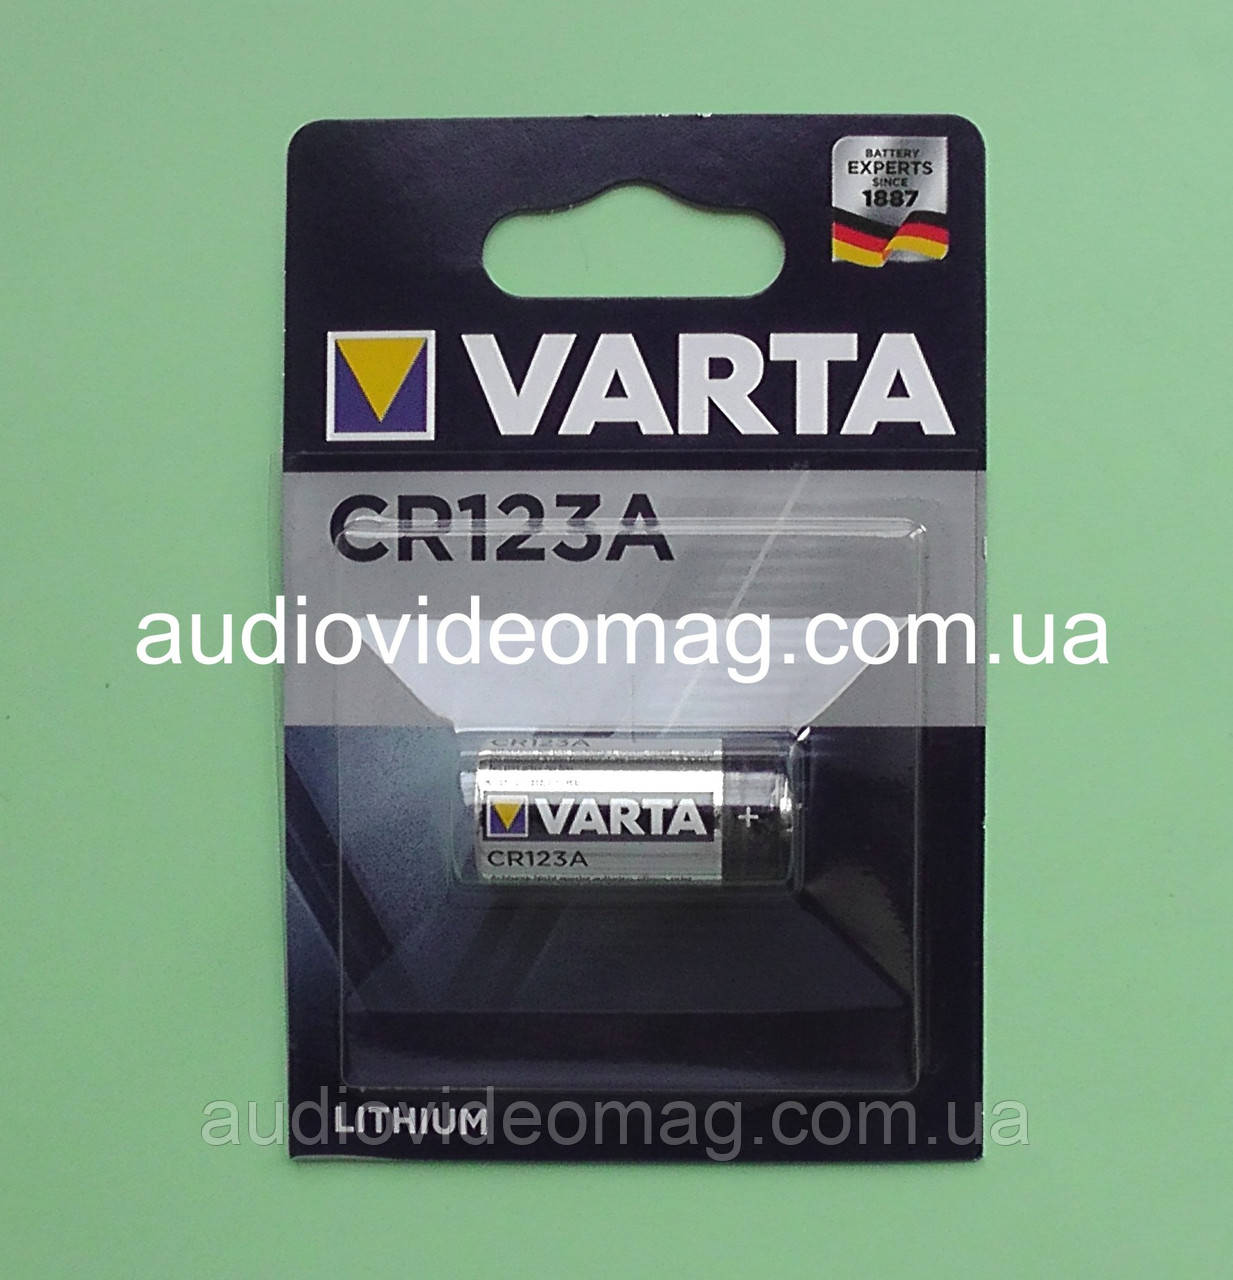 Літієва Батарейка Varta CR123A 3V Lihtium